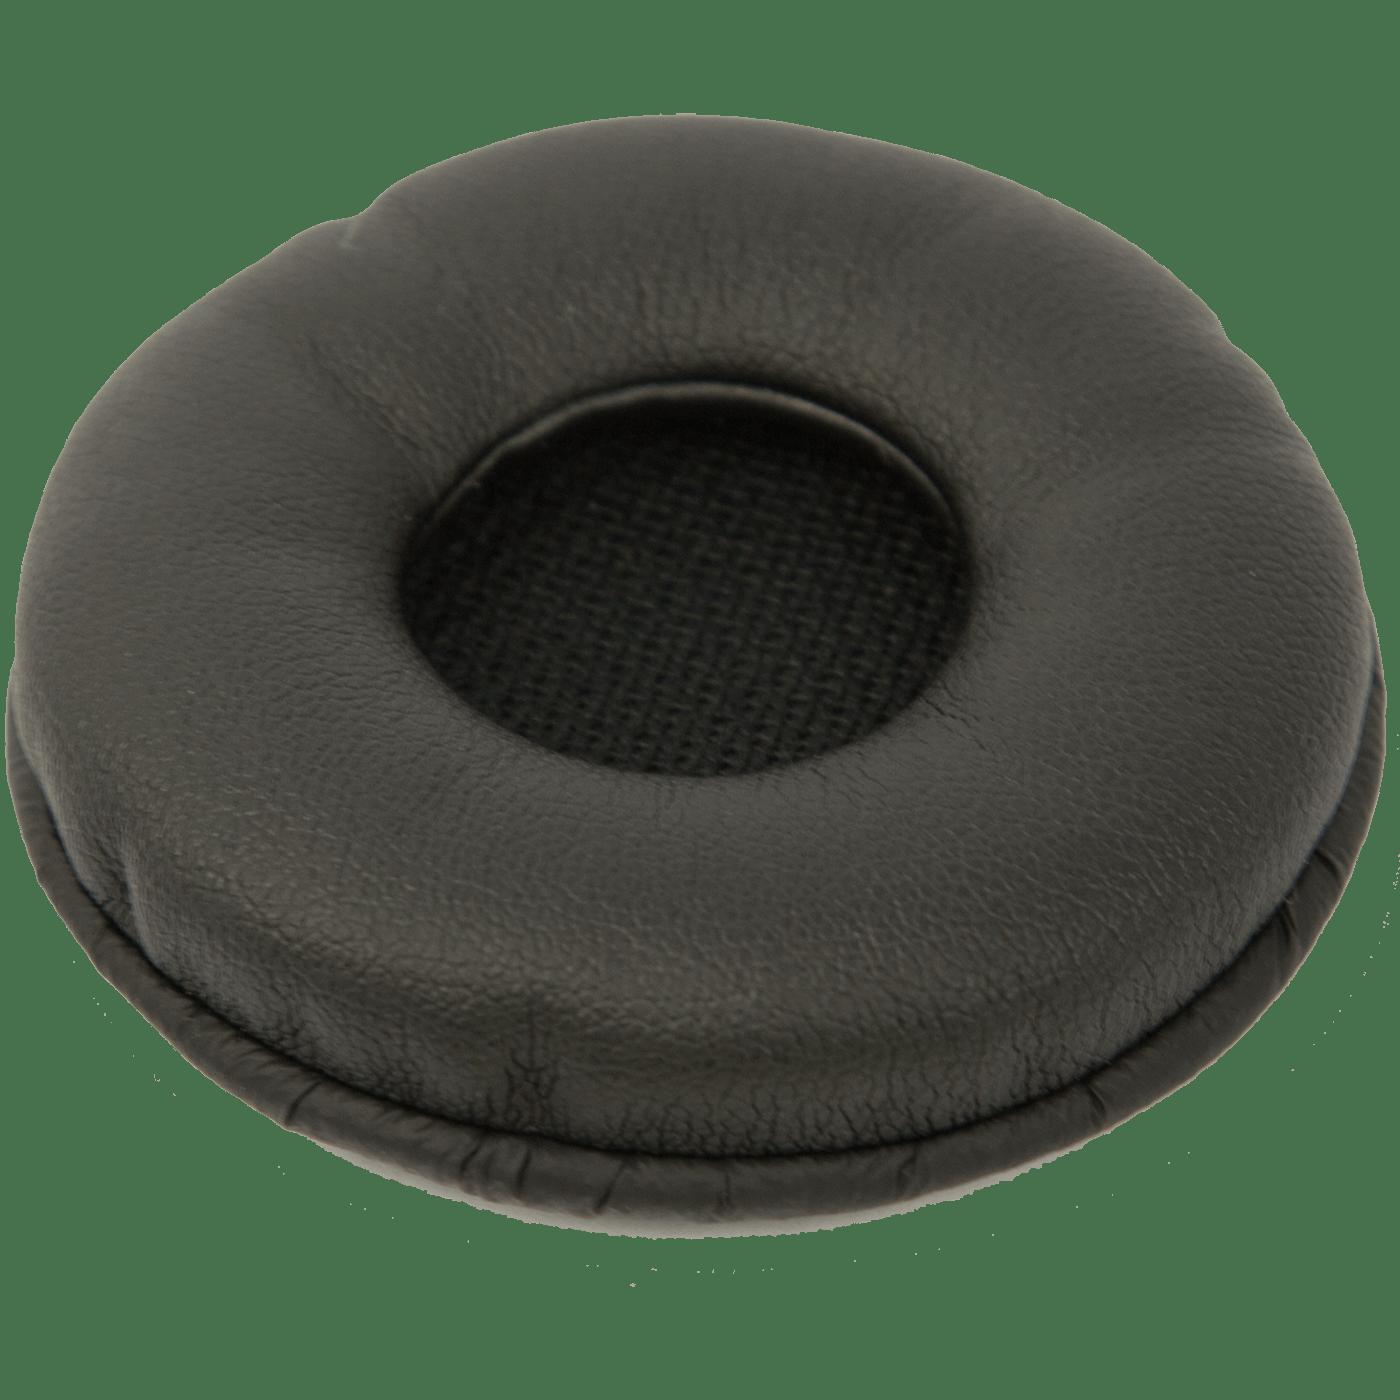 Jabra Biz2300 Leather Ear Cushion